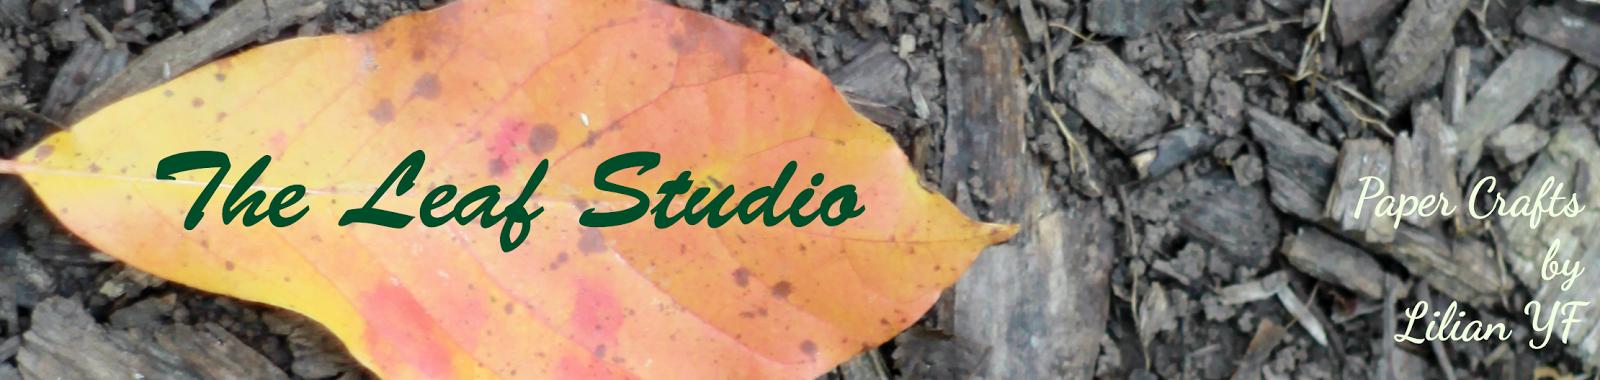 The Leaf Studio